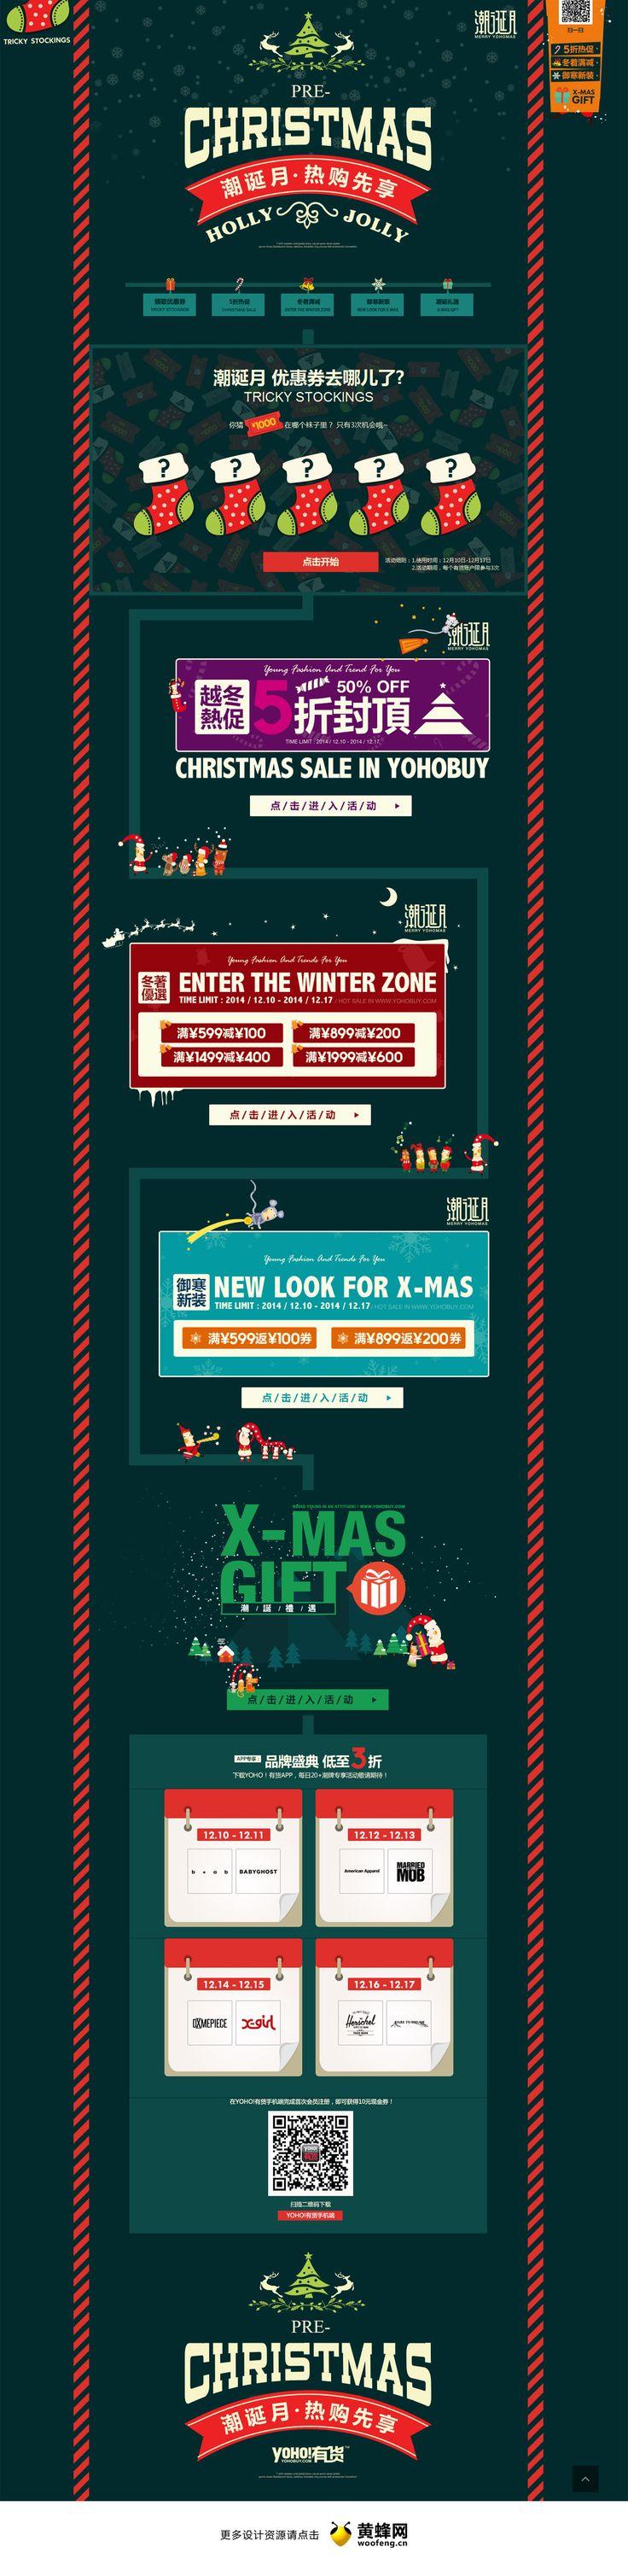 YOHO!有货圣诞节活动专题,来源自黄蜂网http://woofeng.cn/